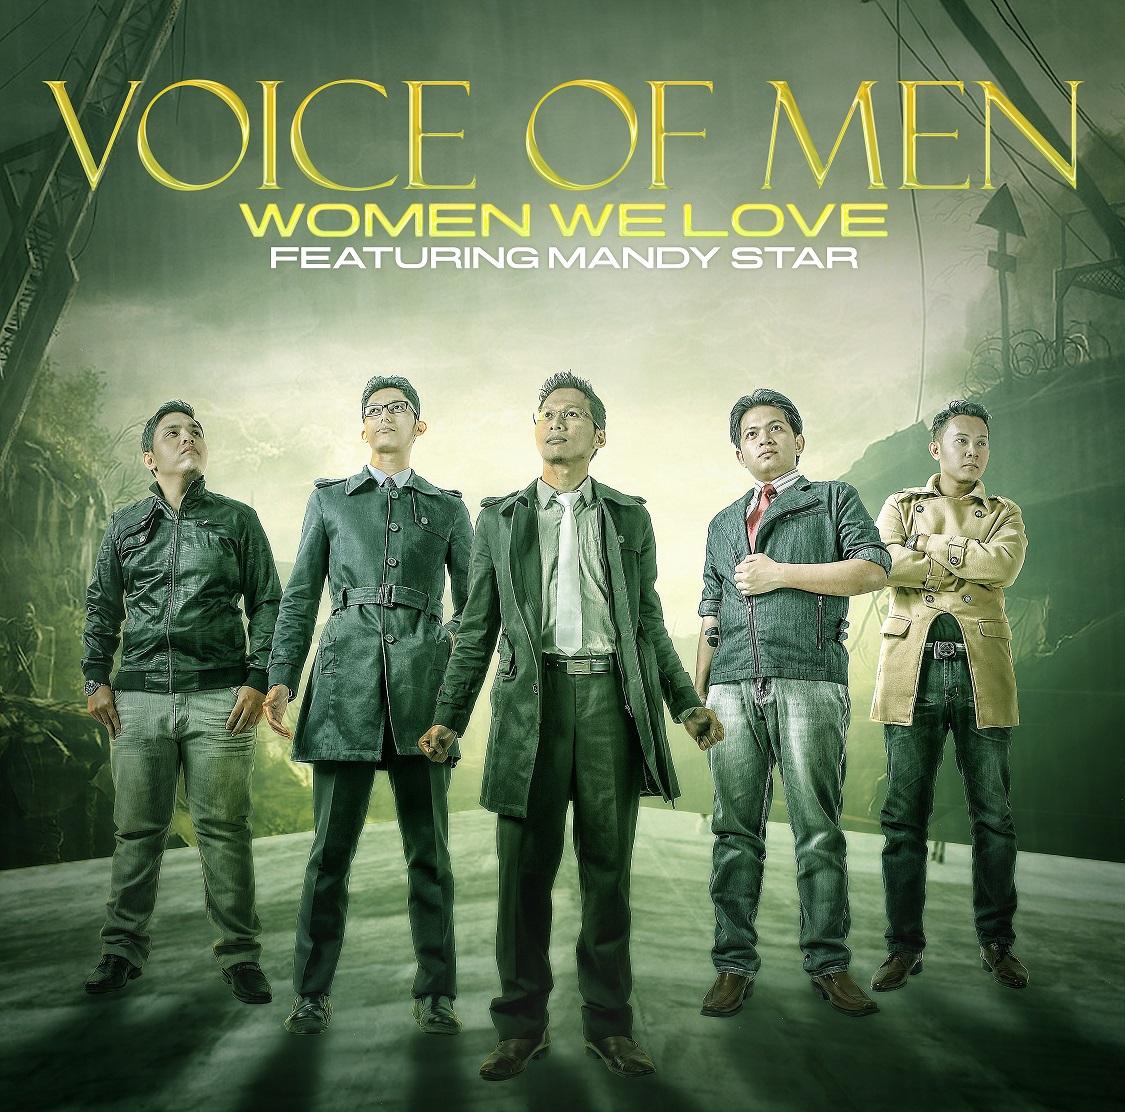 voice-of-men-women-we-love-feat-mandy-star